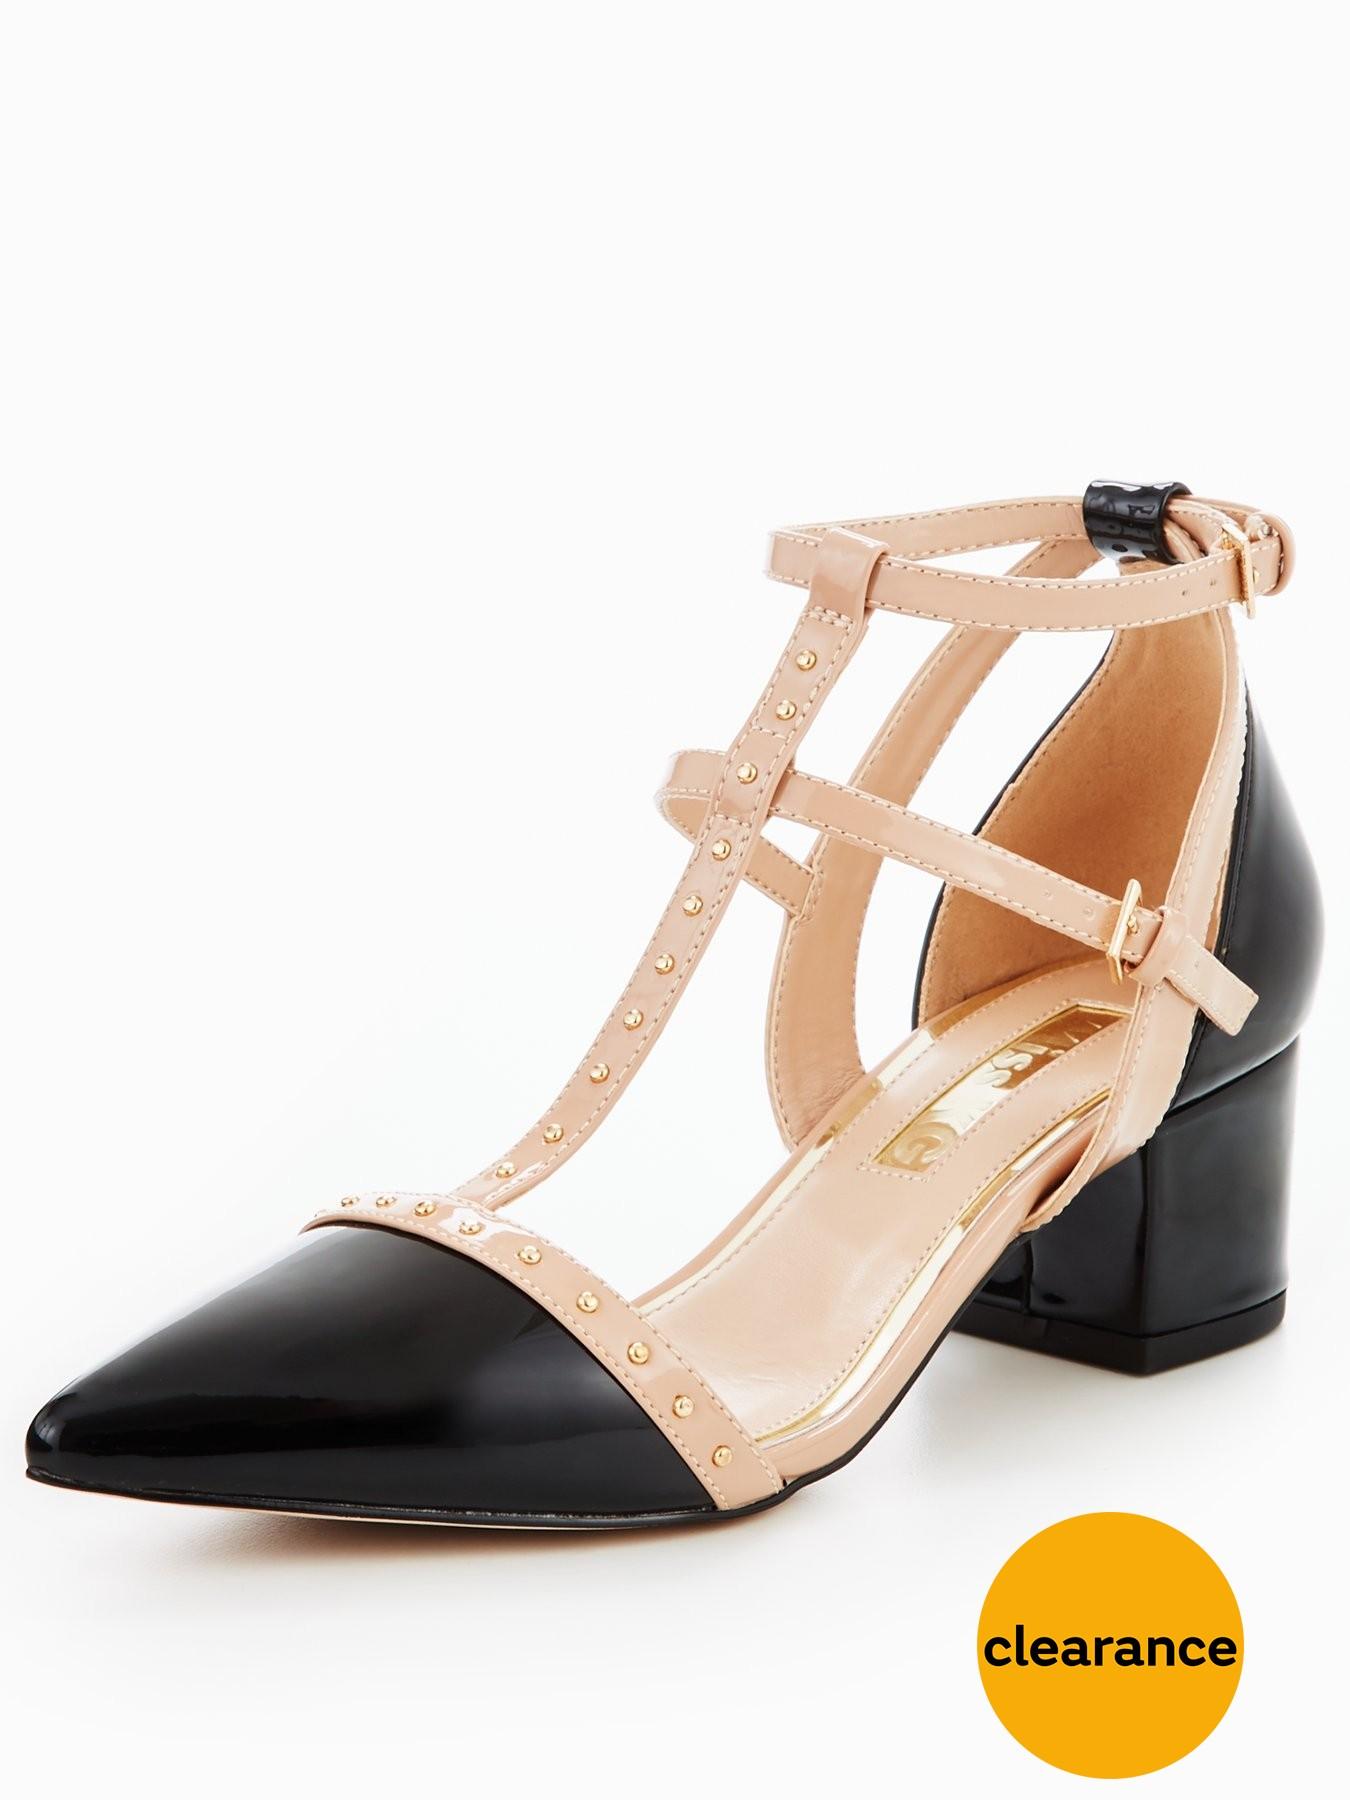 Miss KG Averie Caged Block Heel Sandal 1600179905 Women's Shoes Miss KG Heels